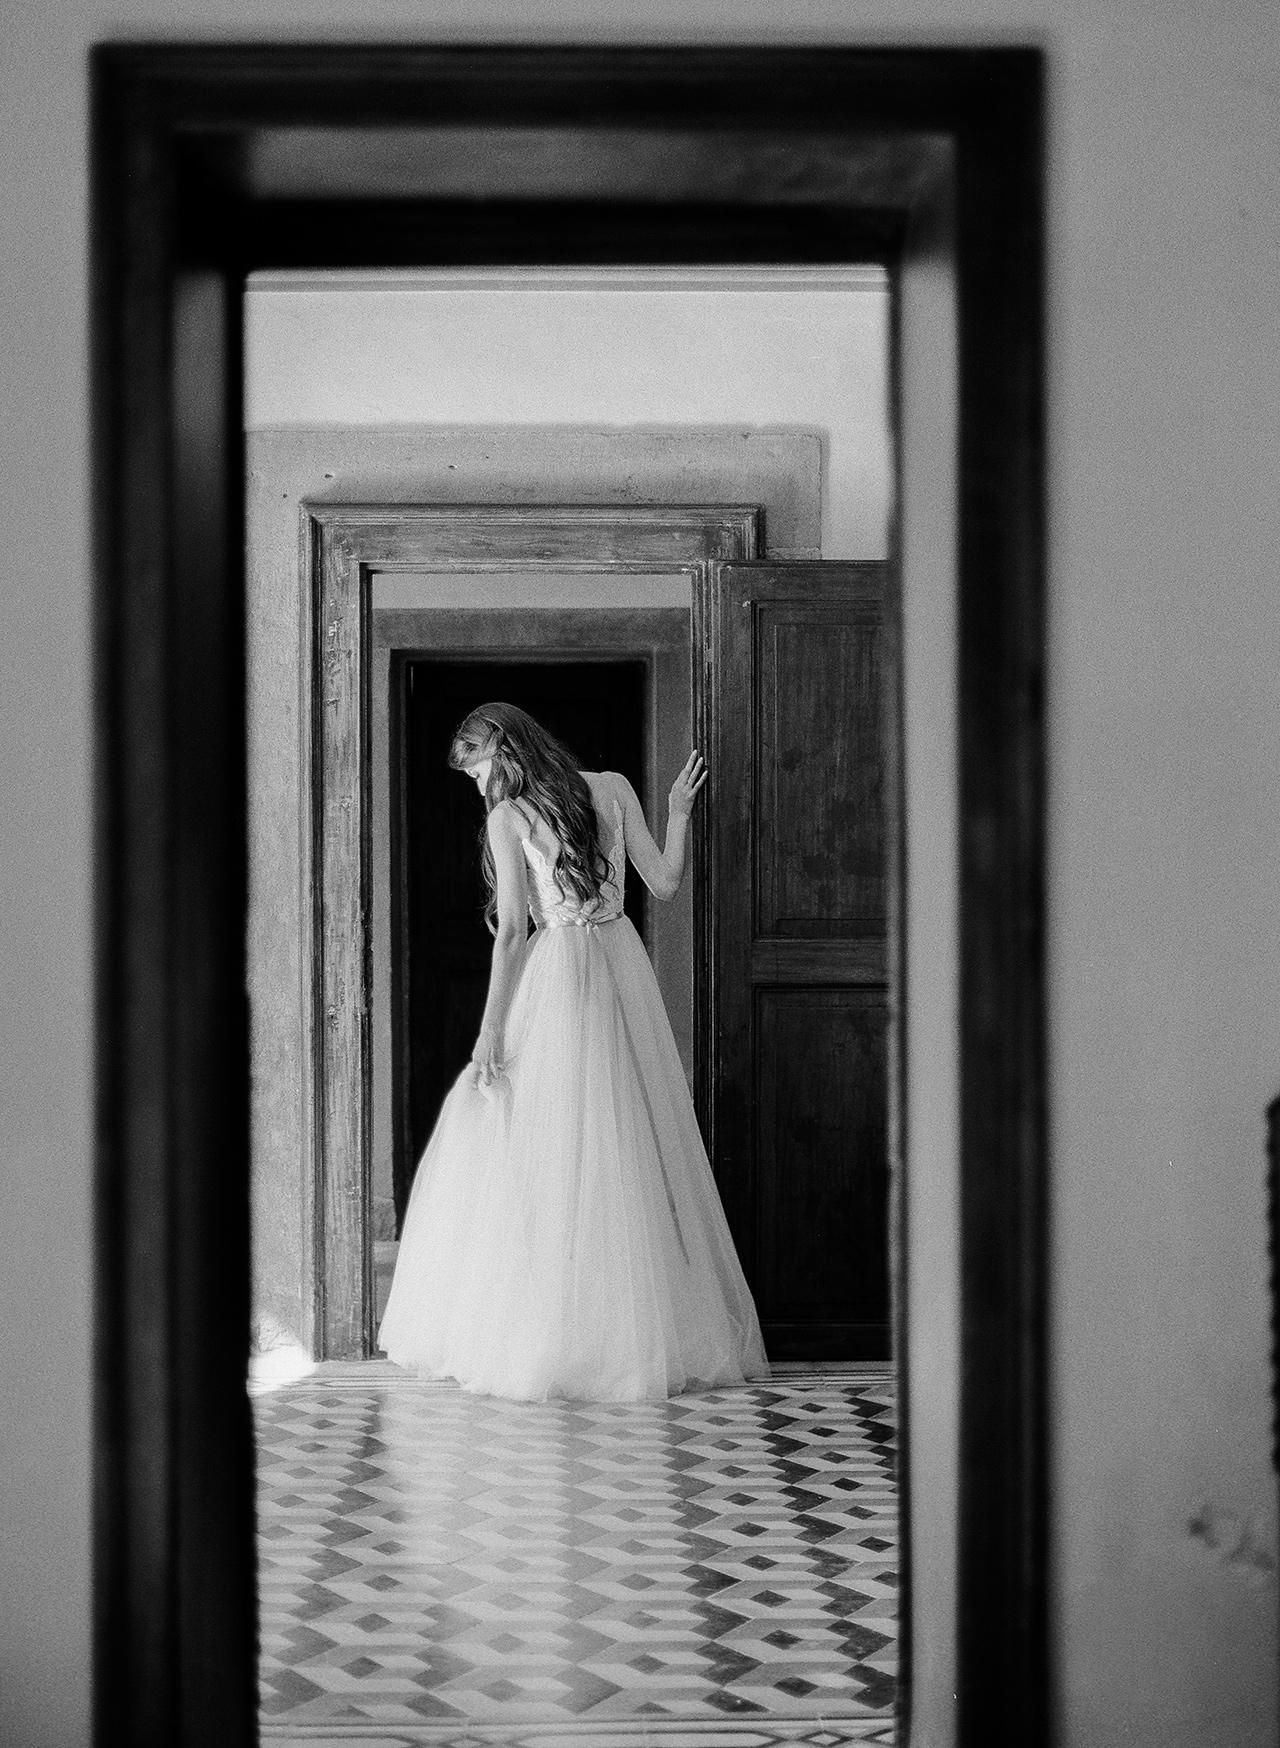 doorway view bride dress and hairstyle